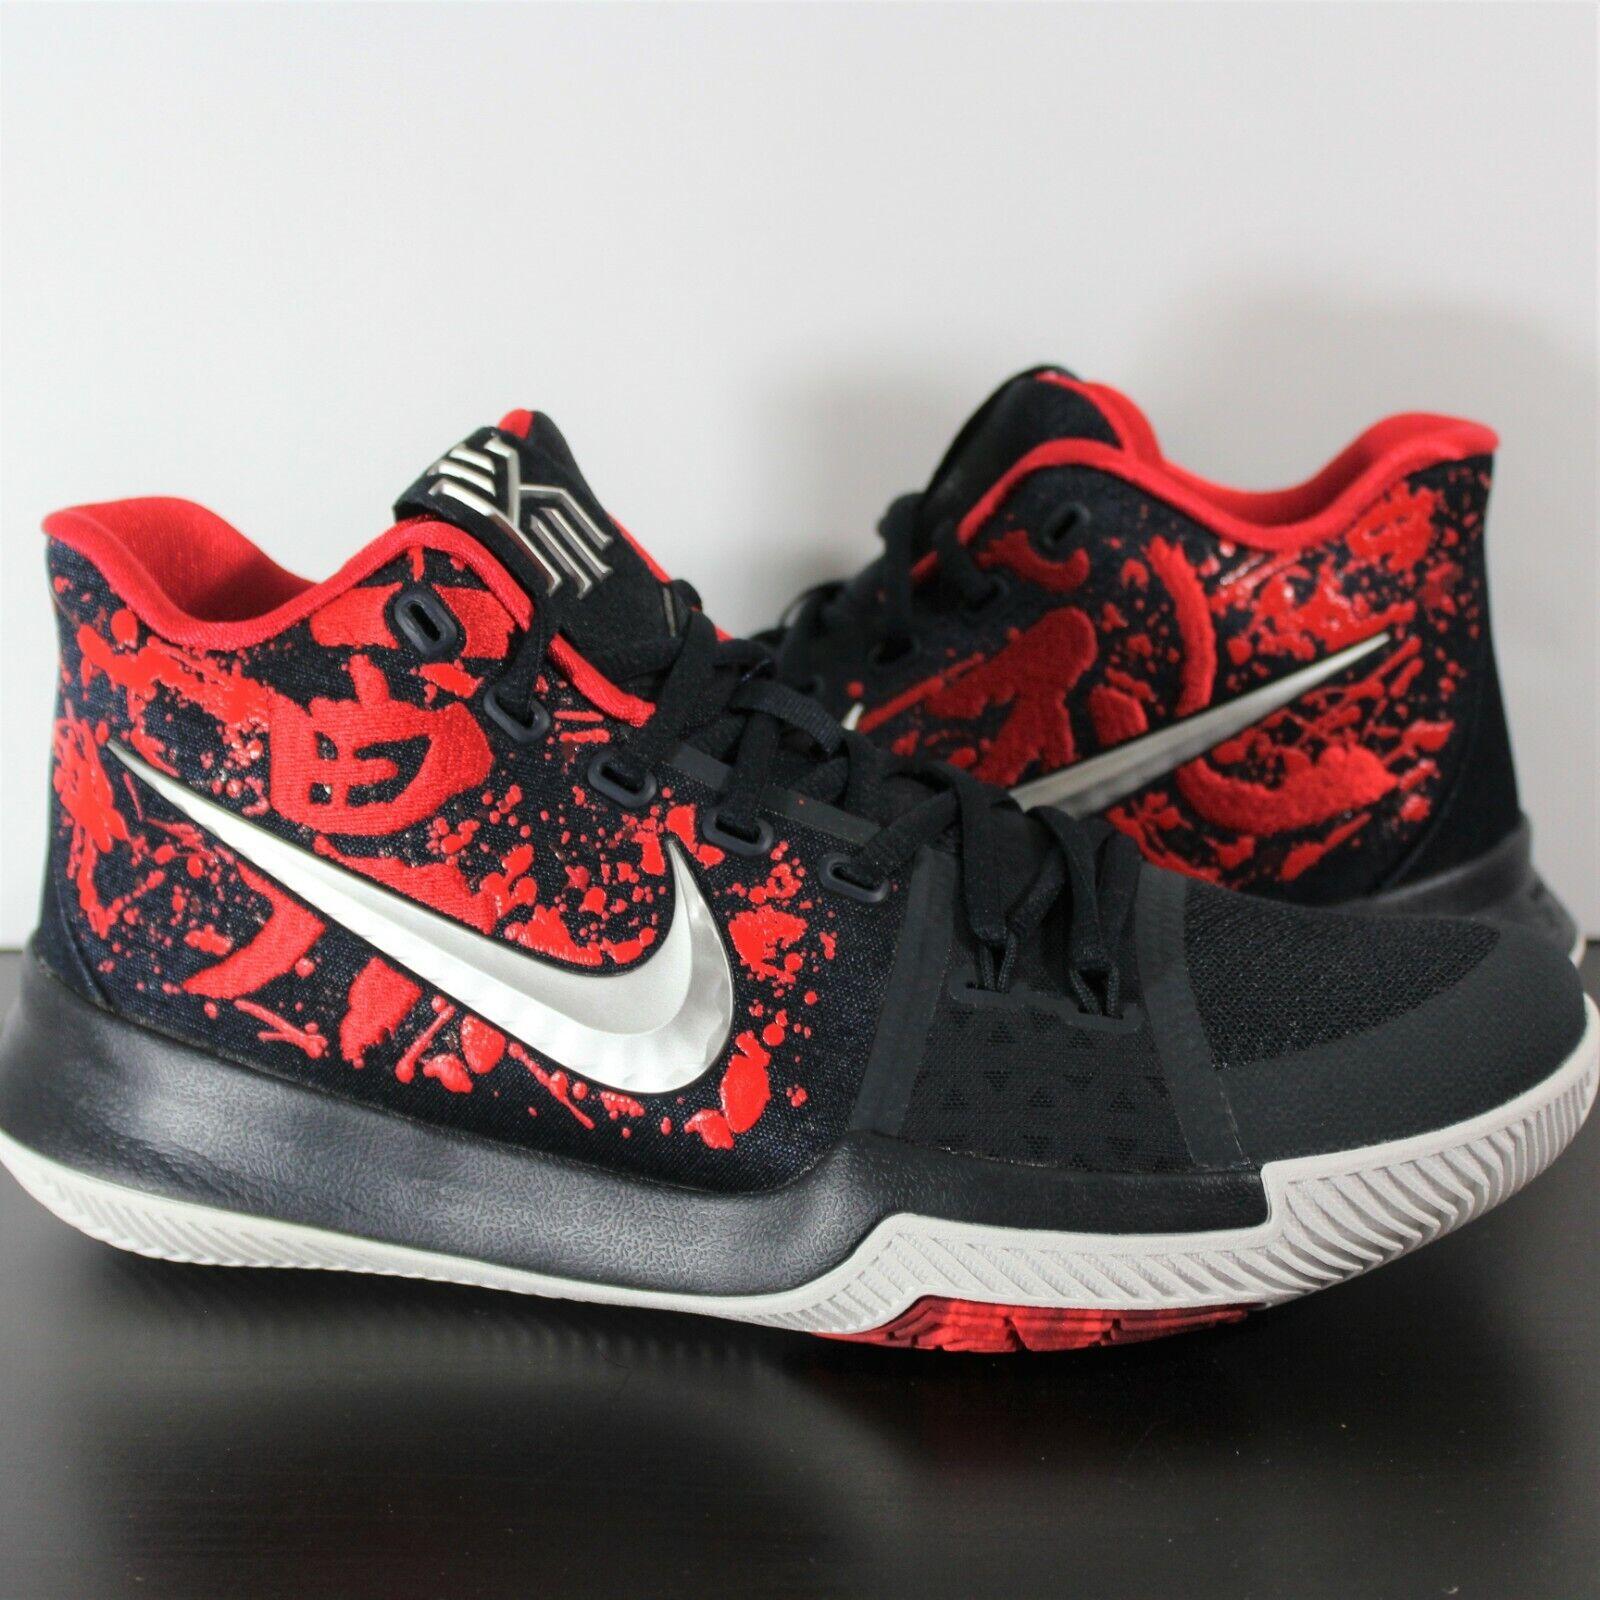 Nike Kyrie III 3 Samurai Christmas Mystery bluee Red 852395 900 10.5 R797